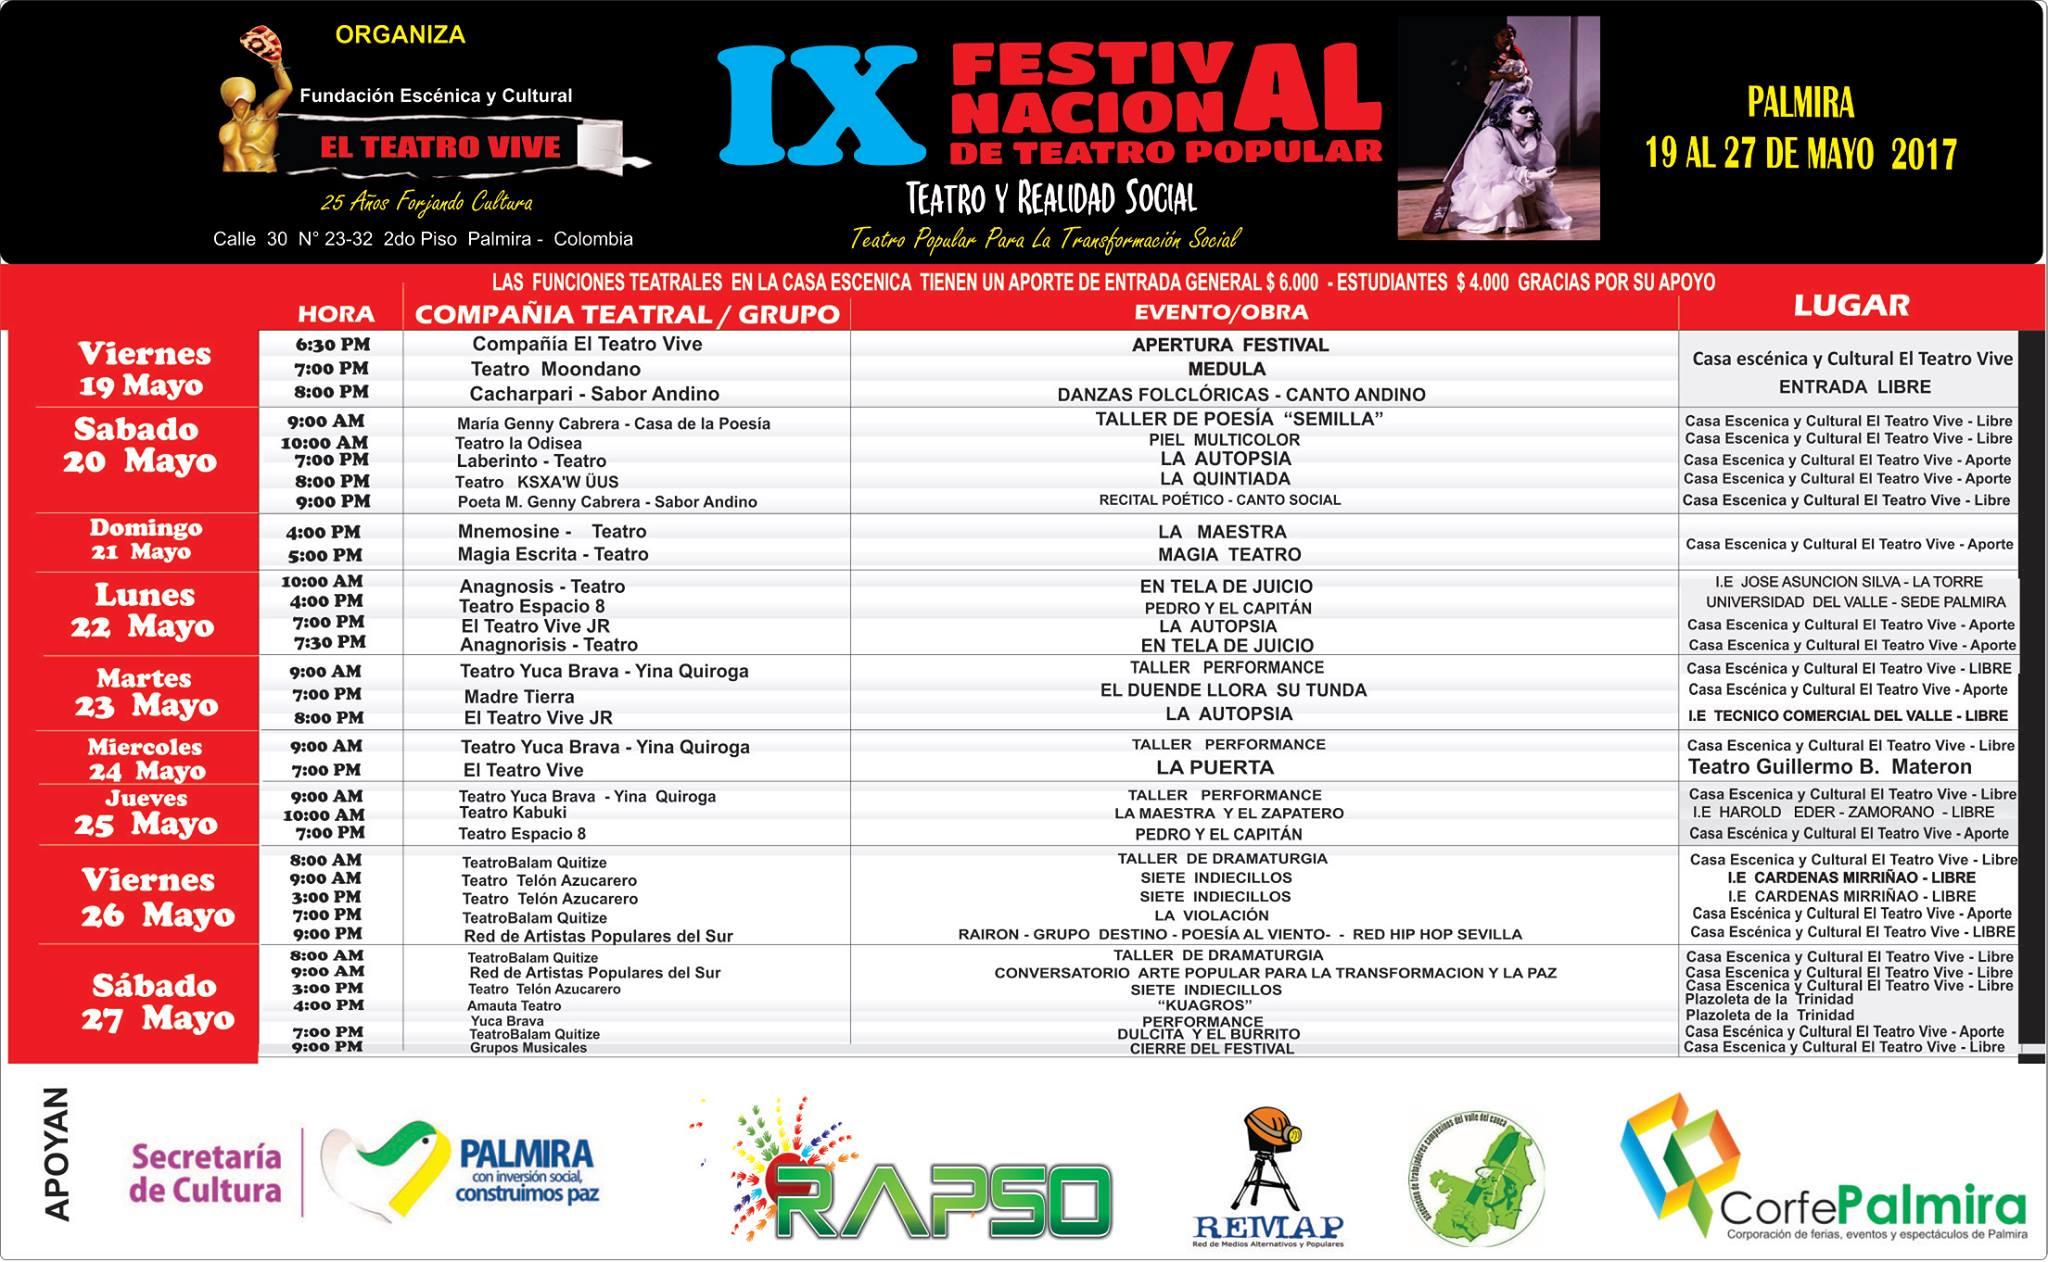 El viernes inicia Festival de Teatro Popular en Palmira - Programacion-IX-Festival-Nacional-de-Teatro-Popular